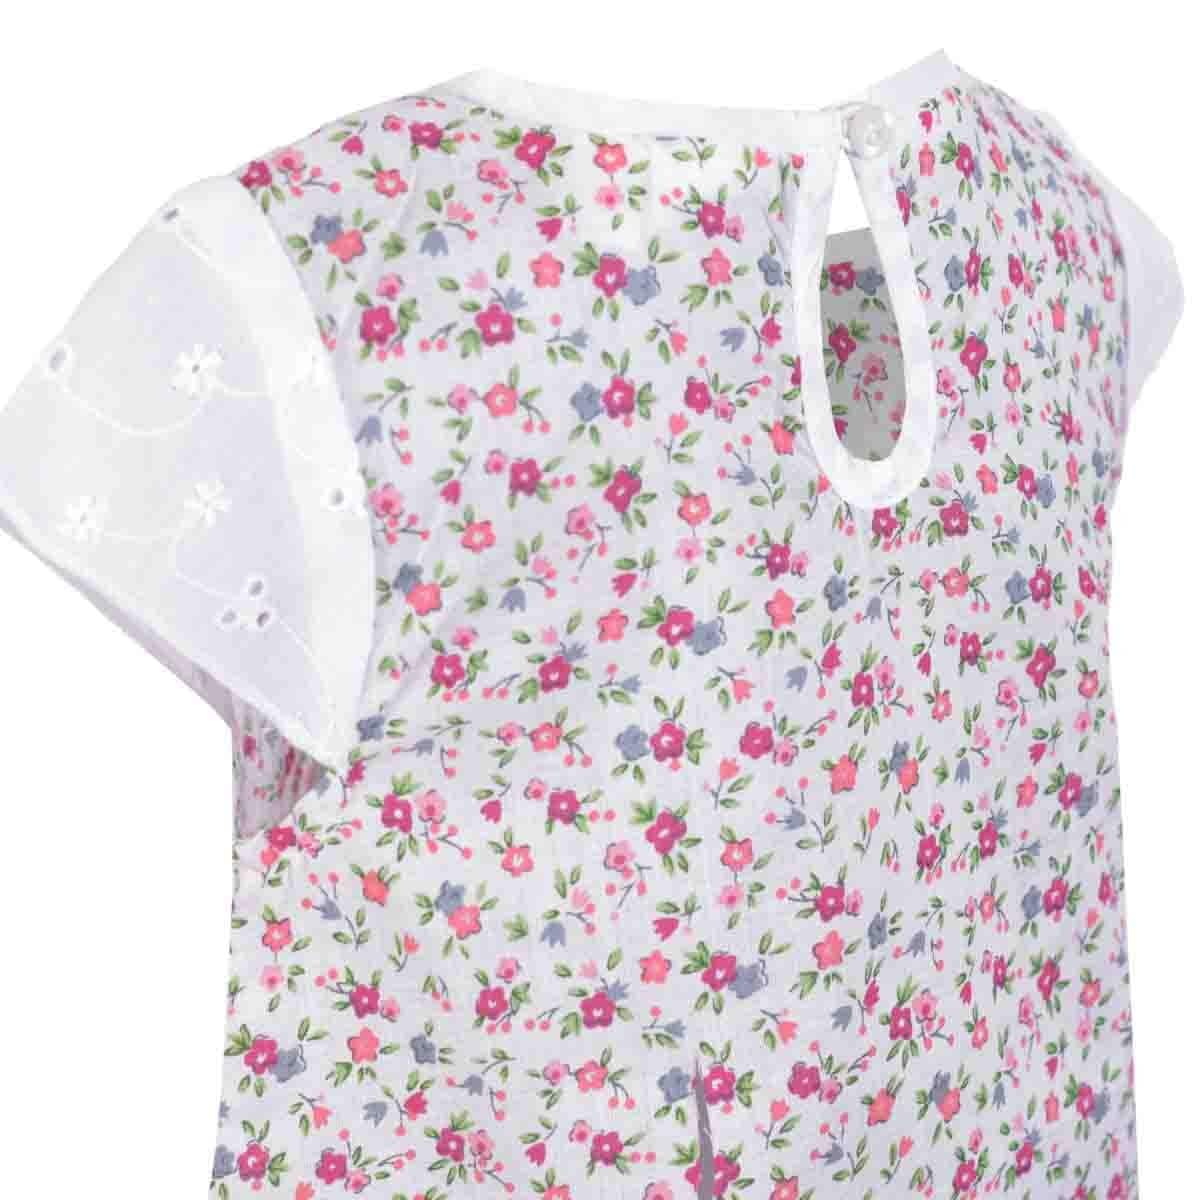 Blusa Manga Corta Estampada Flores Carosello Ver18-46